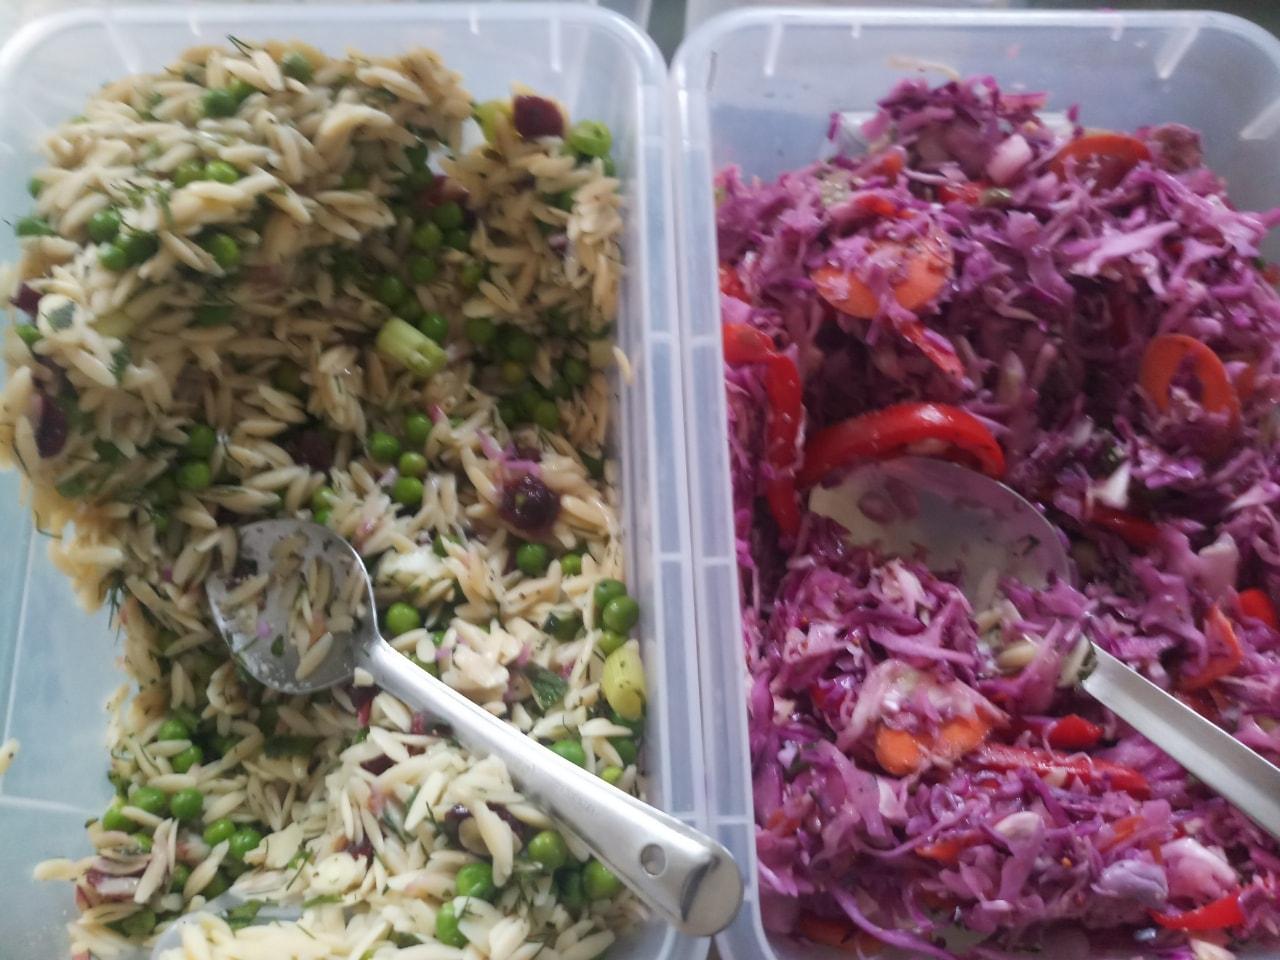 Planet kuku - Salad